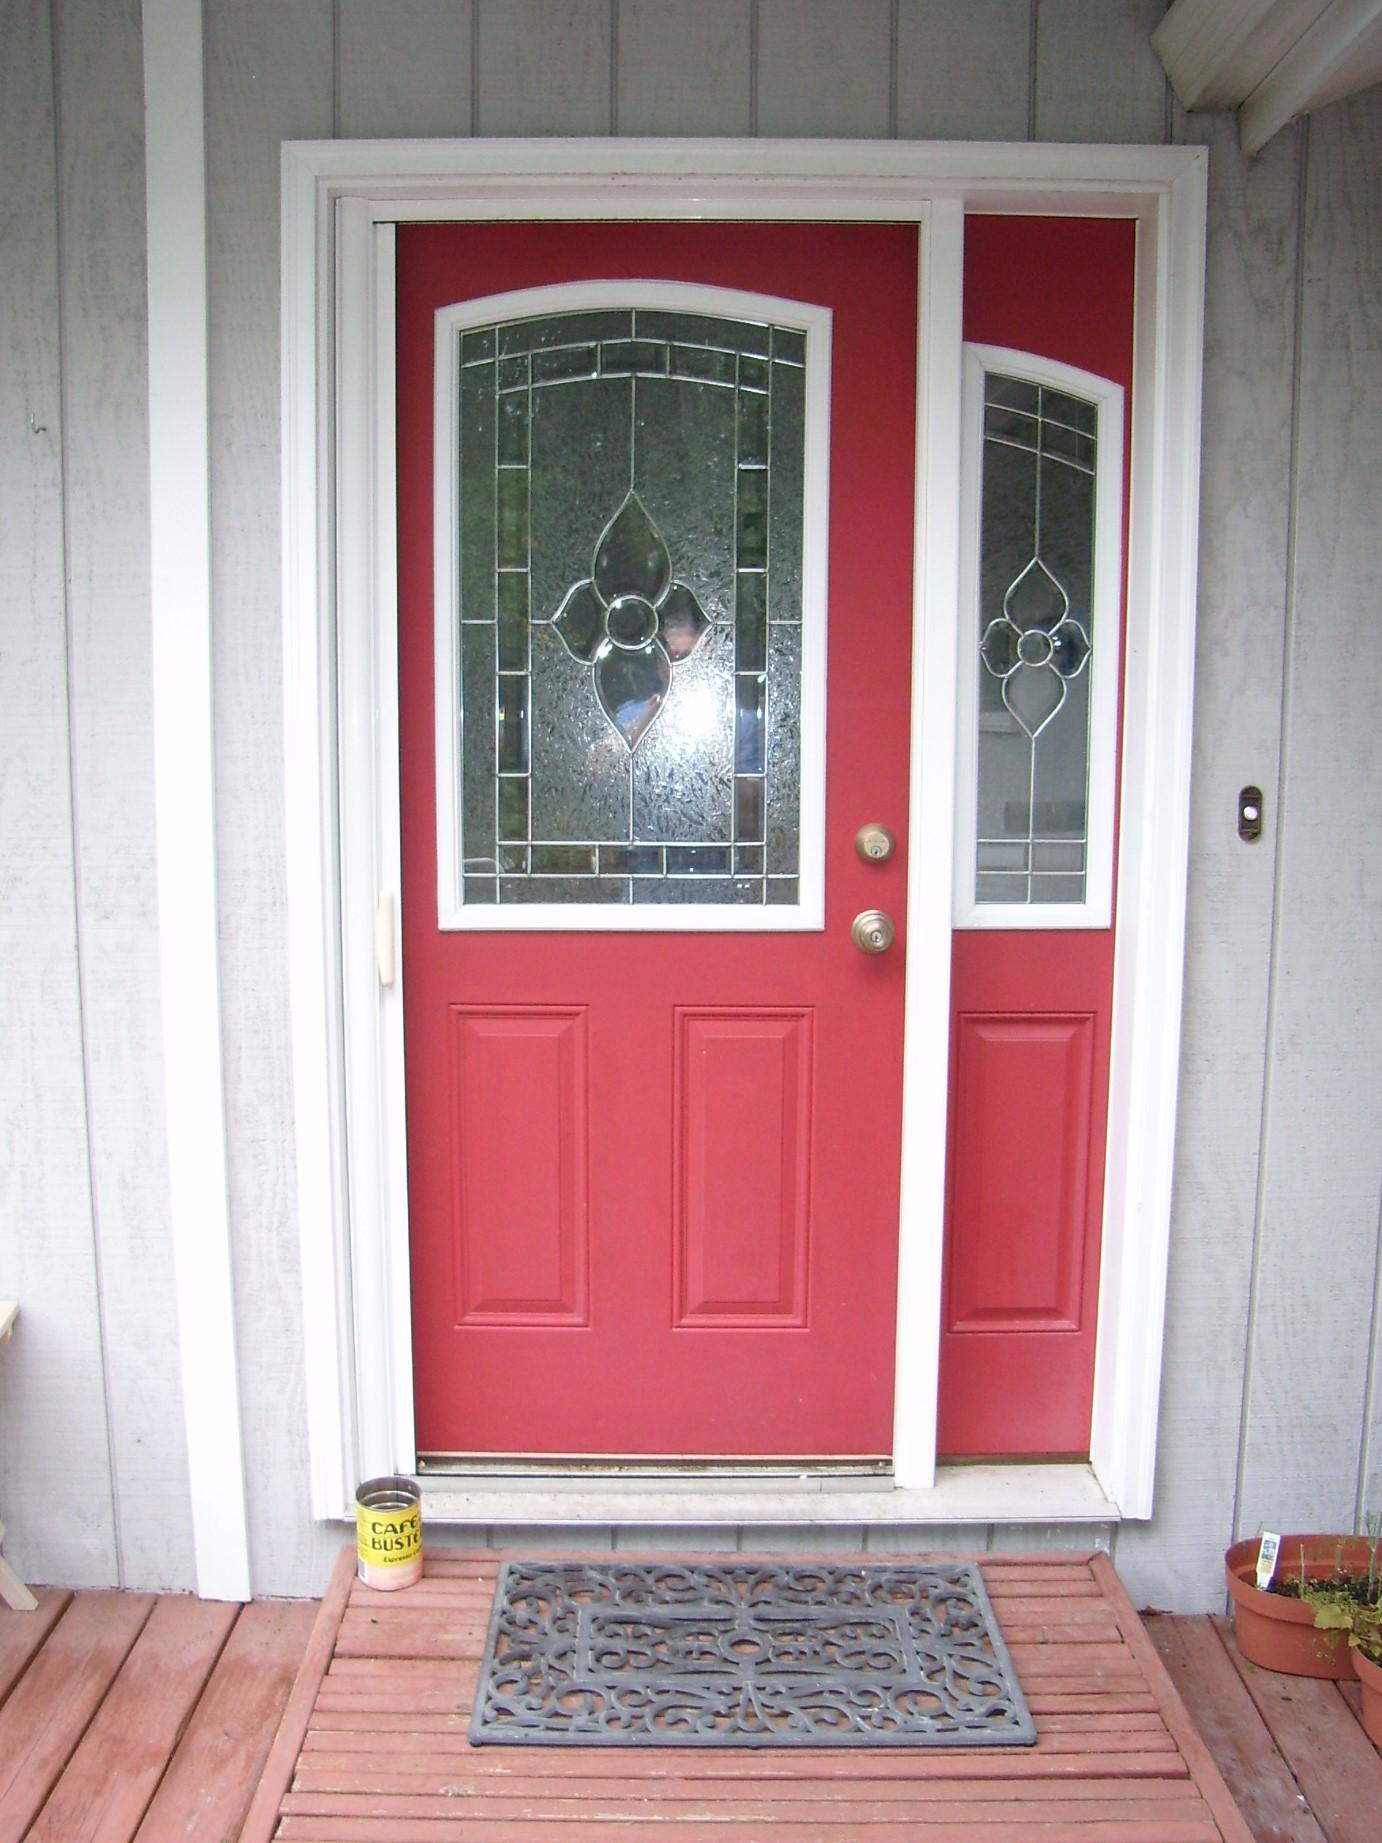 Door Installation - ABC Inc. on